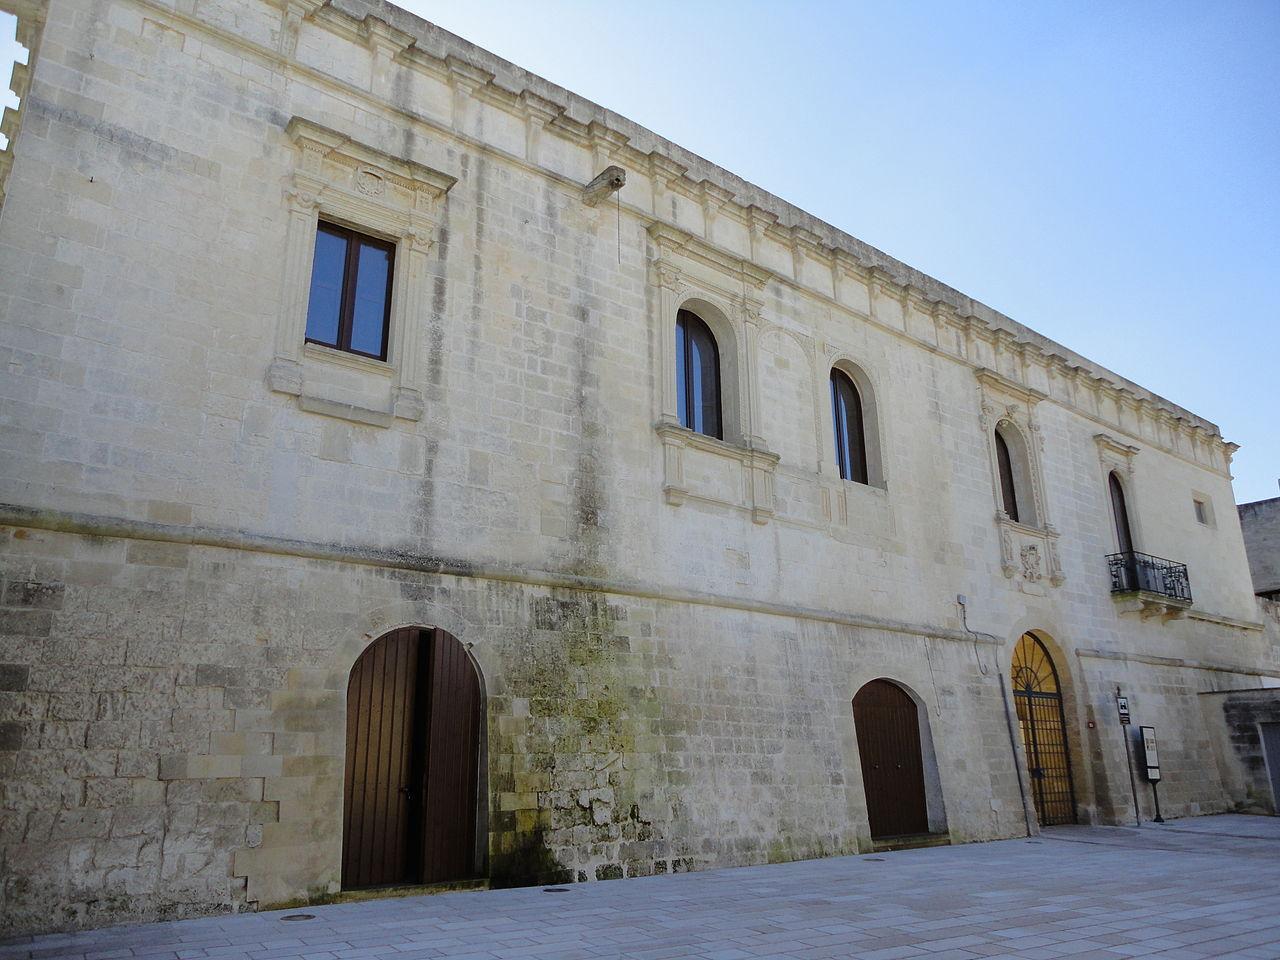 Castrignano de' Greci – Veduta